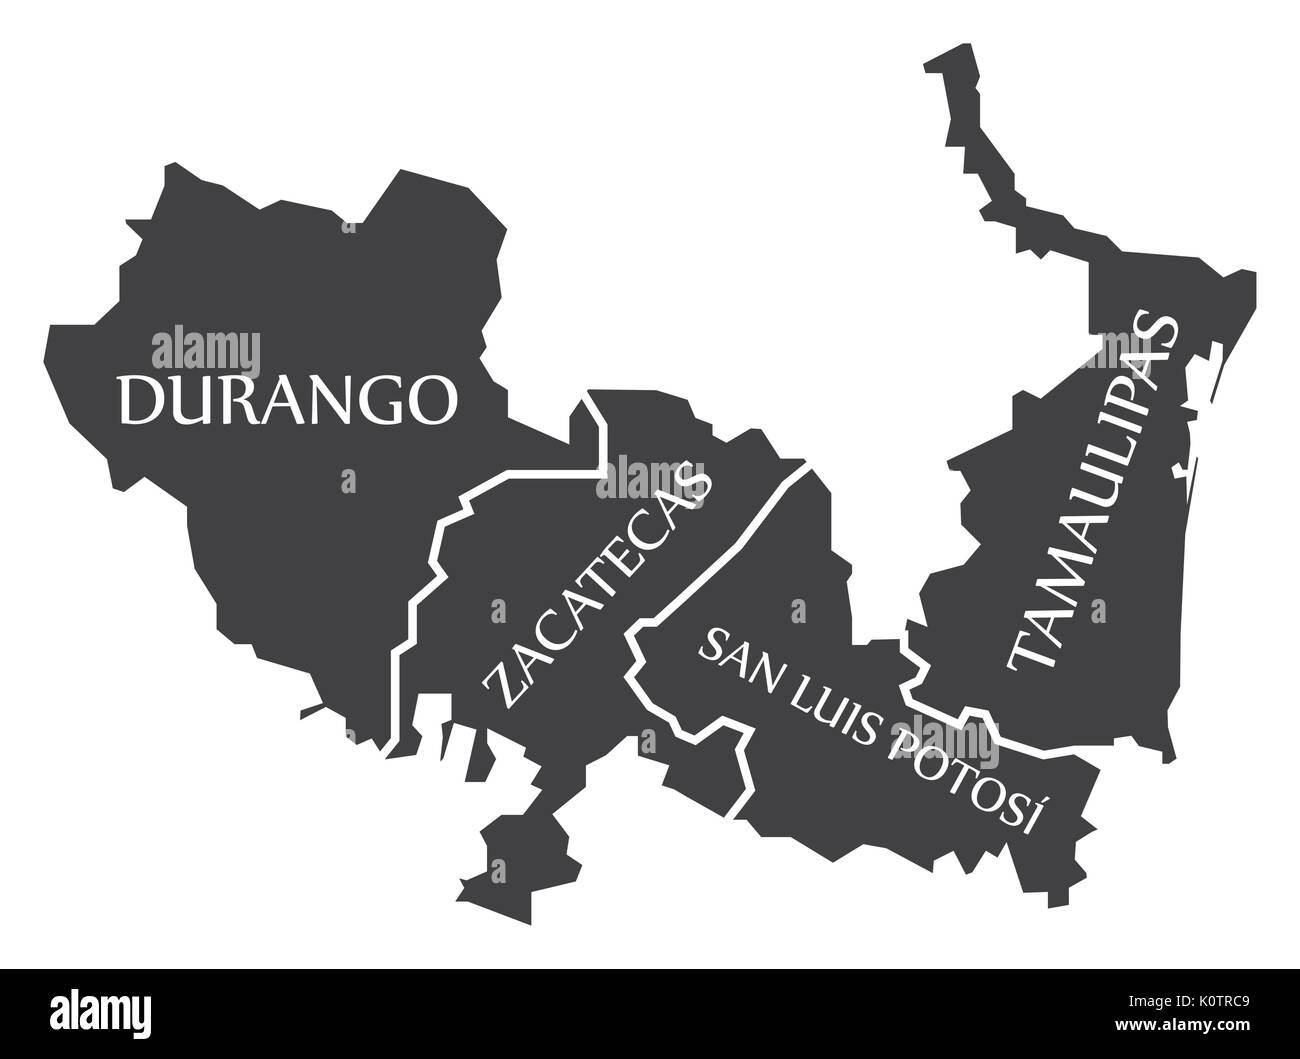 durango zacatecas san luis potosi tamaulipas map mexico